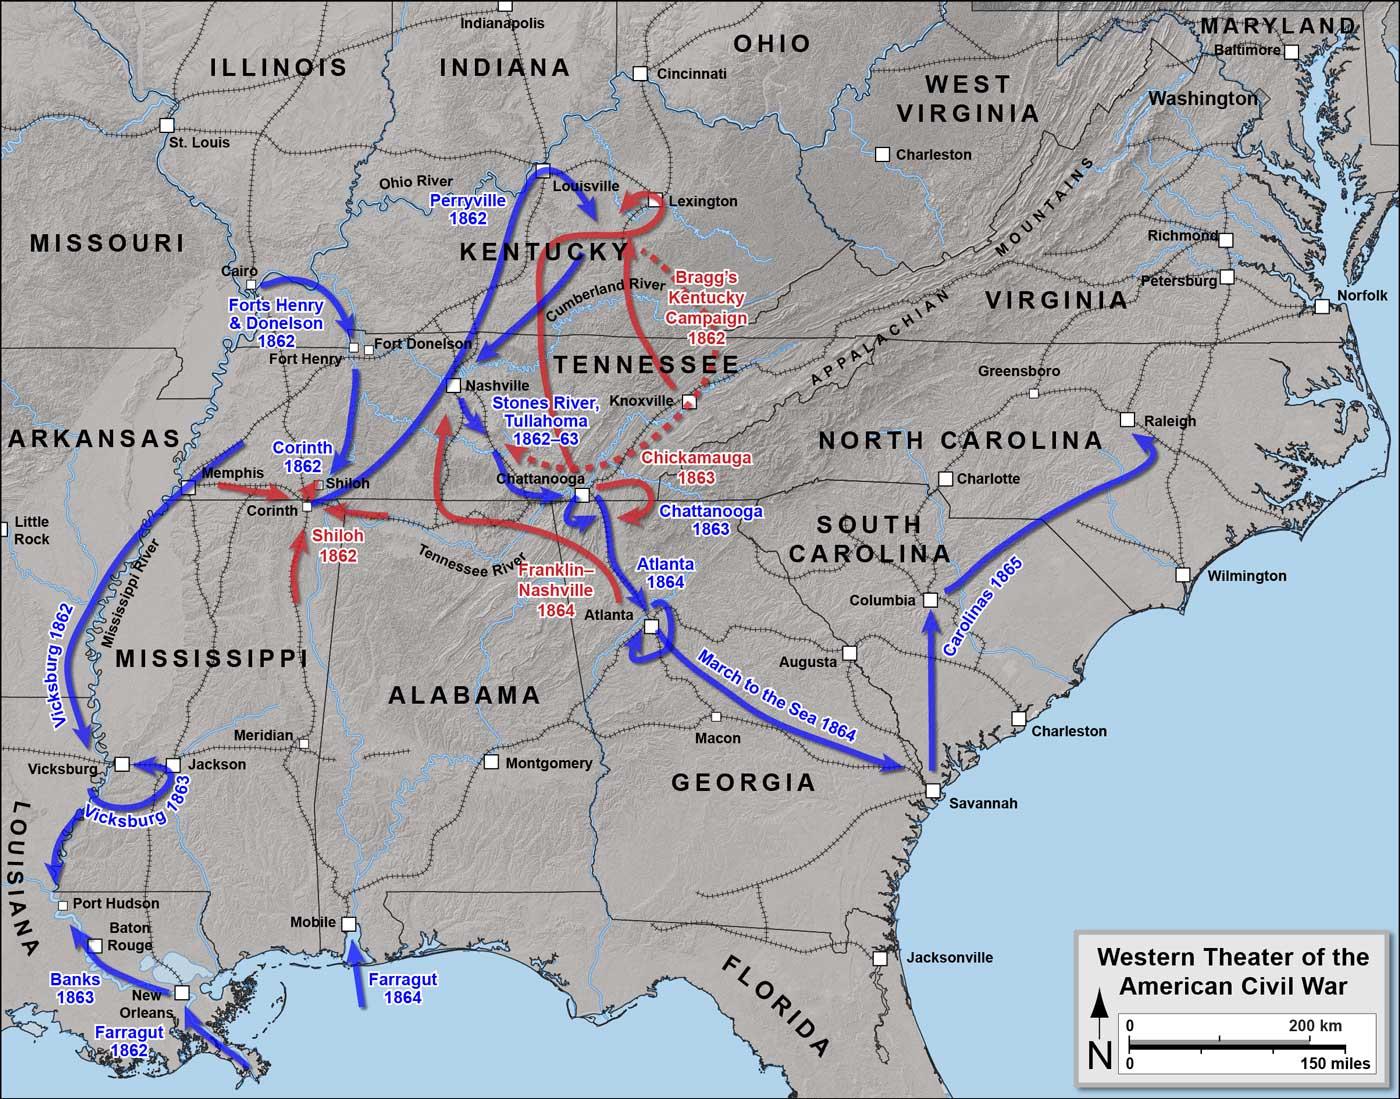 Civil war battle maps 1861 1865